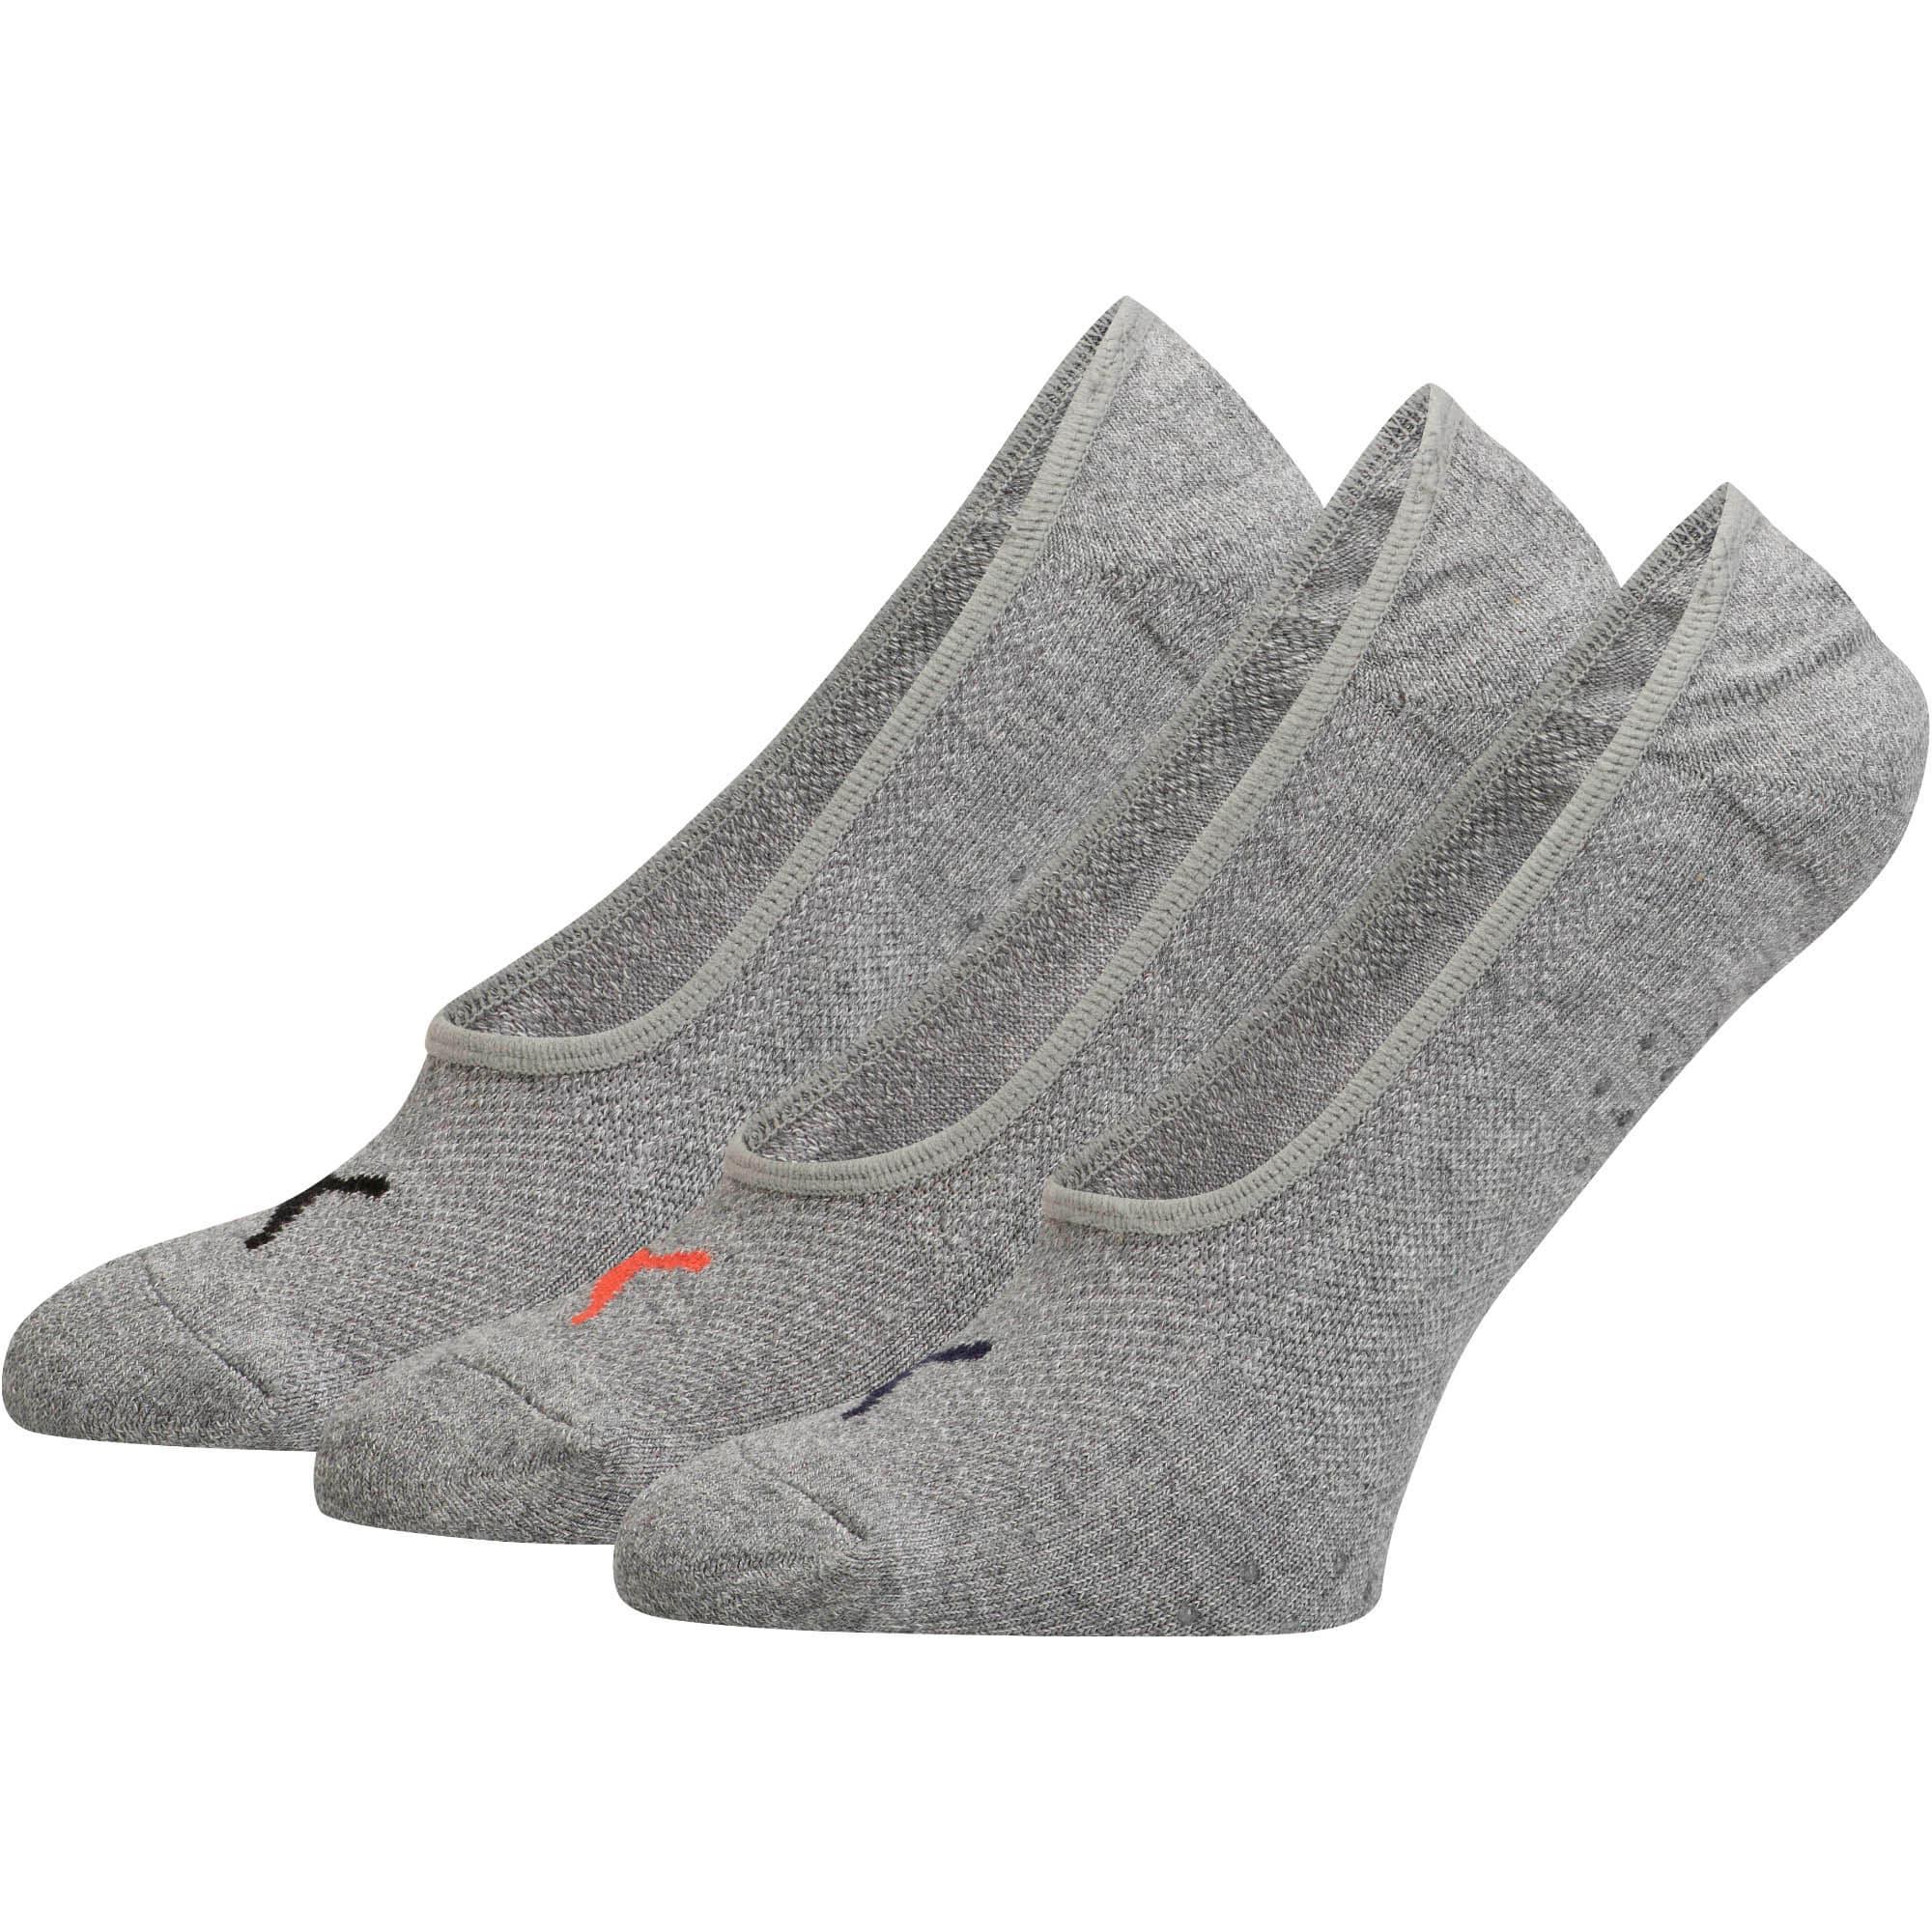 Thumbnail 1 of Women's Select Terry Liner Socks [3 Pack], GREY / PINK, medium